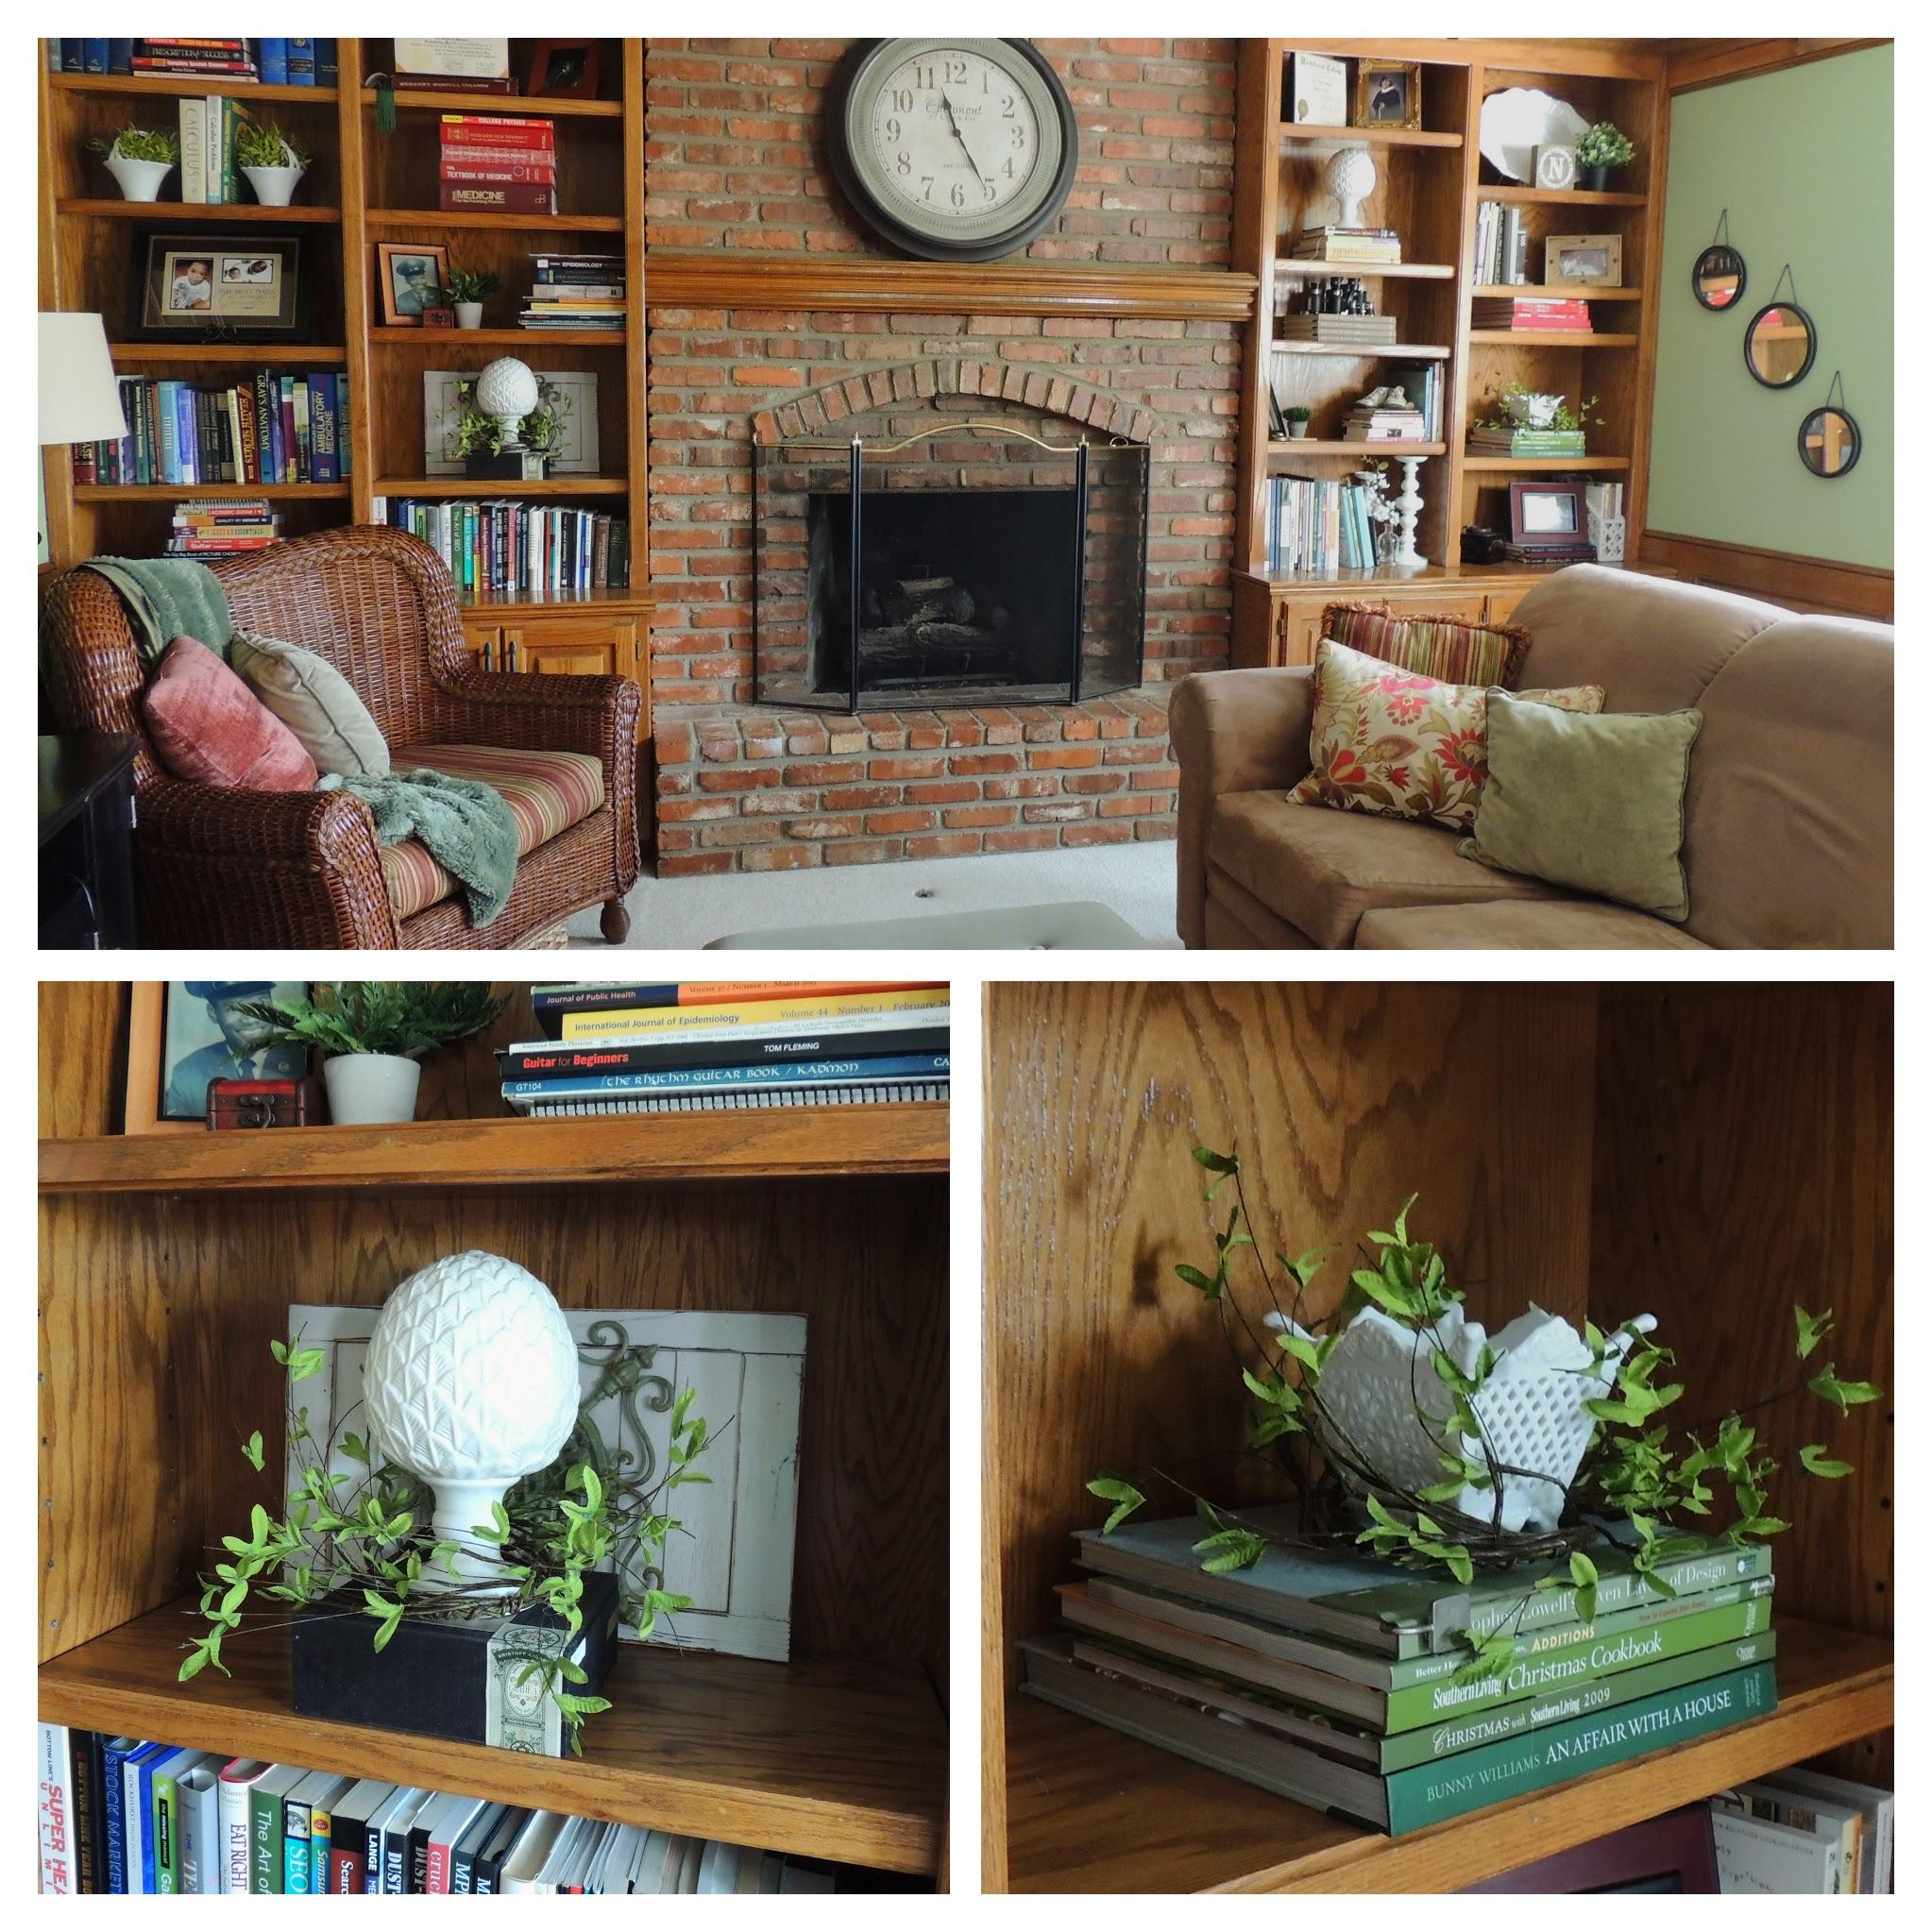 Living room bookshelves. www.tabletwentyone.wordpress.com